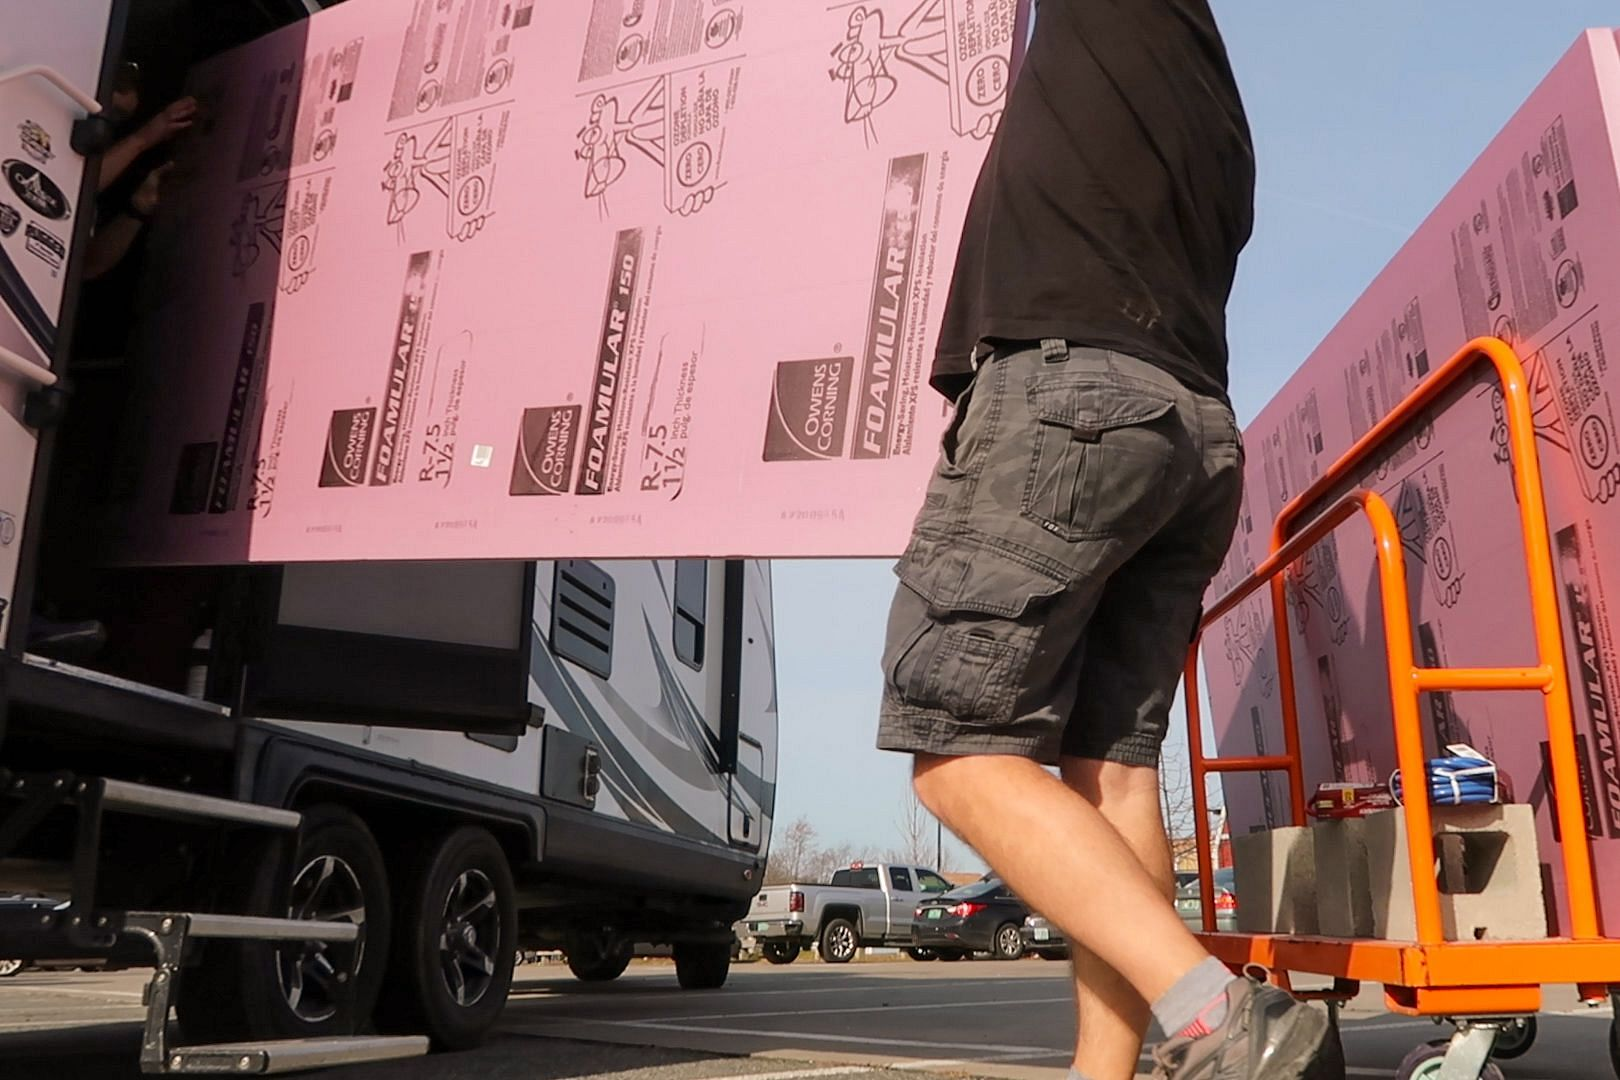 RV Transporting Foam Board Insulation